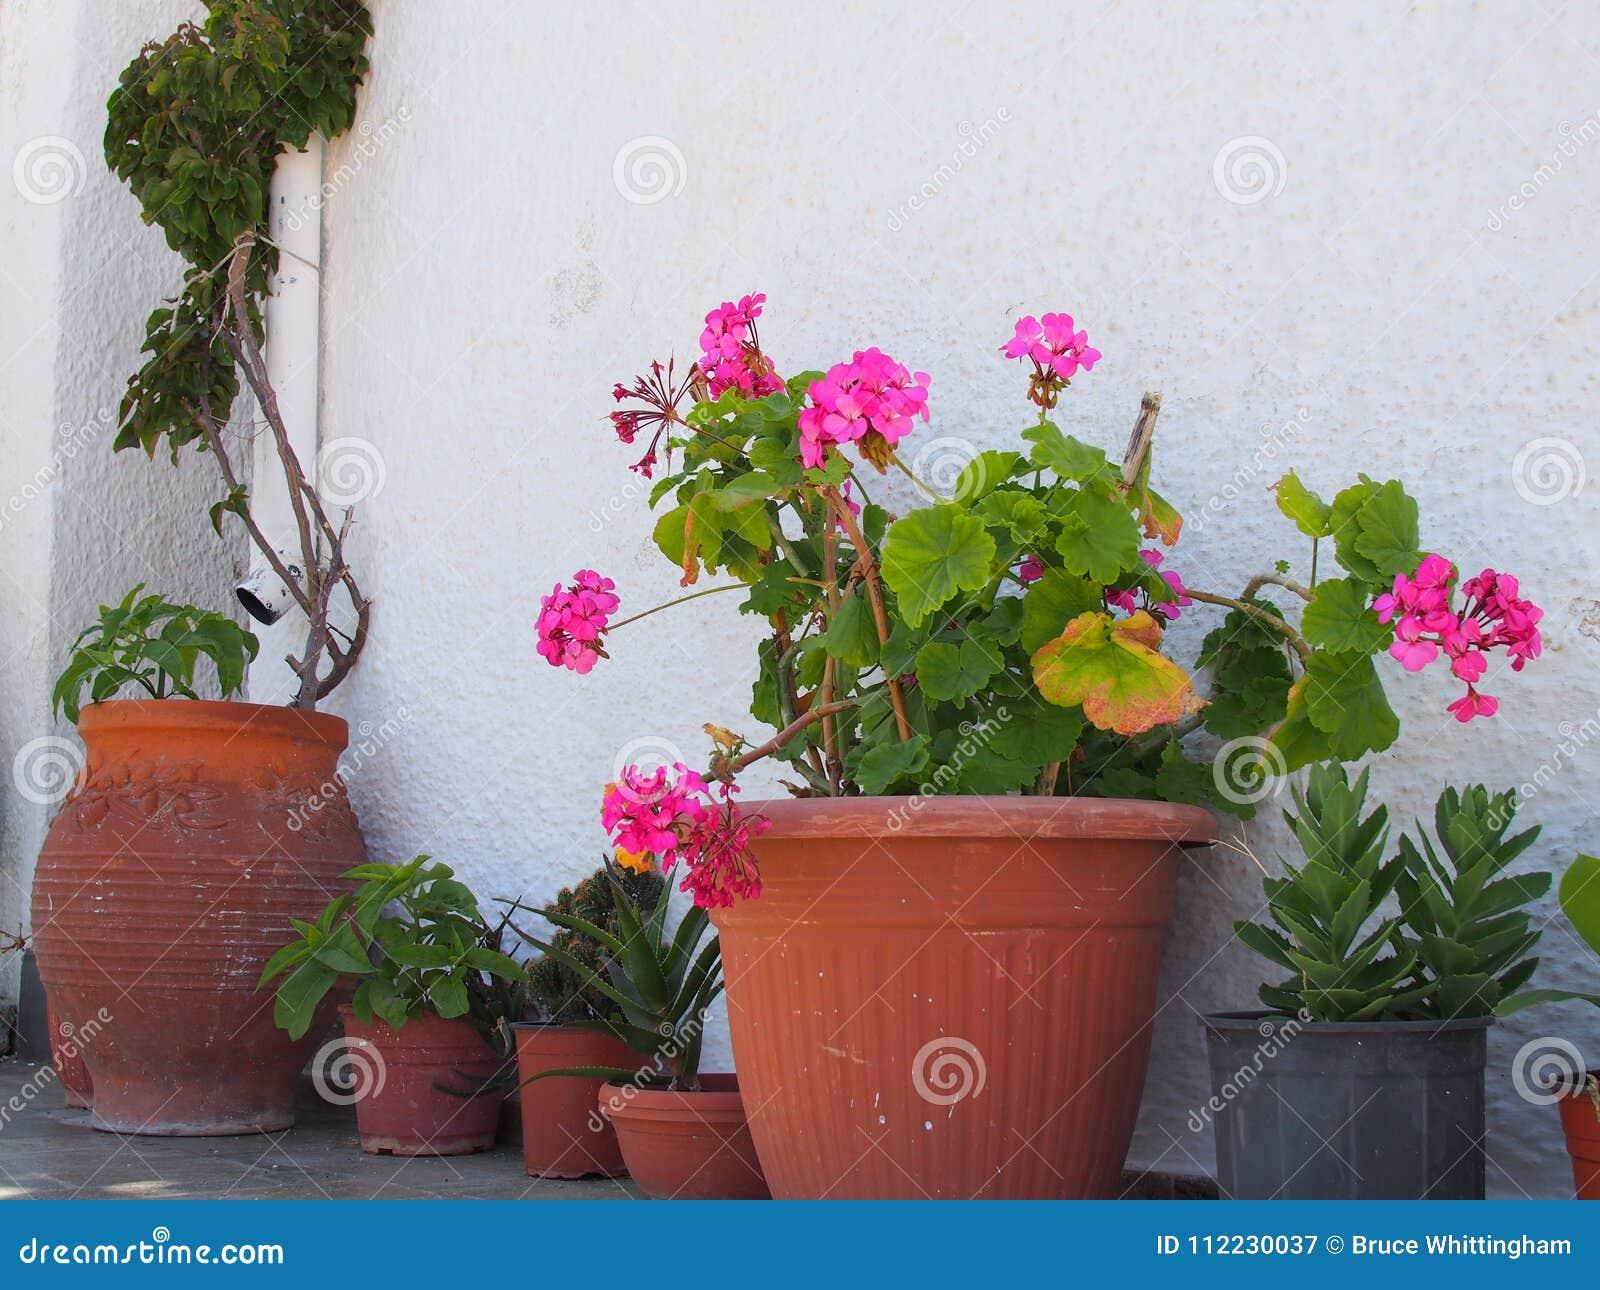 Terracotta flower pots outside white greek island house stock image green pot plants and pink flowers in terracotta pots outside a white painted greek island house greece mightylinksfo